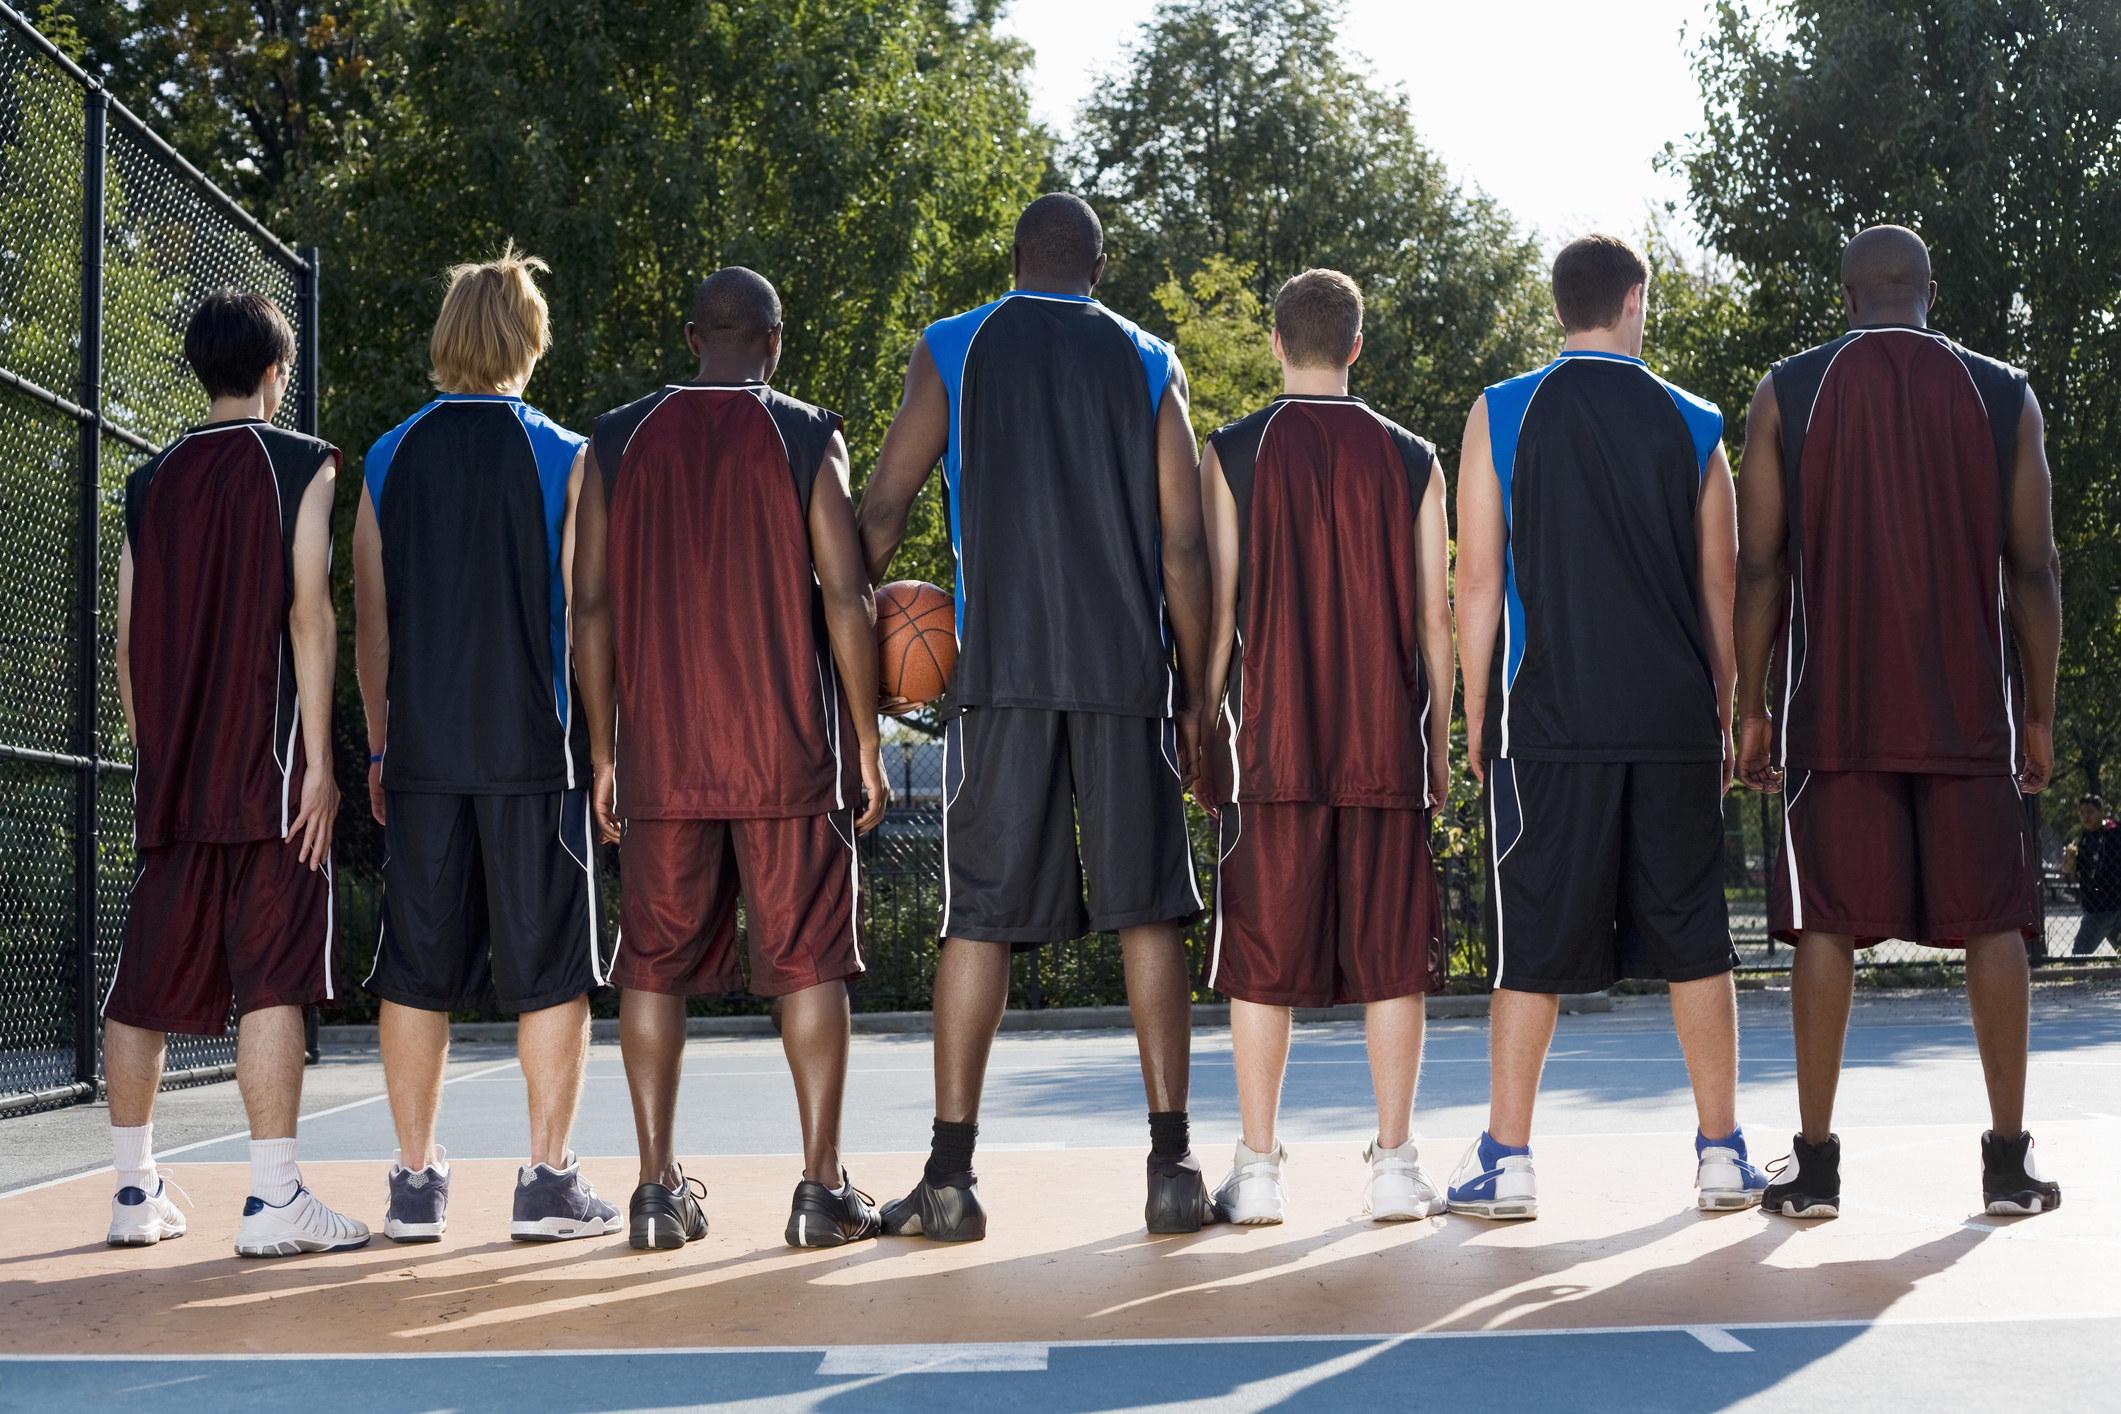 a lineup of tall basketball players